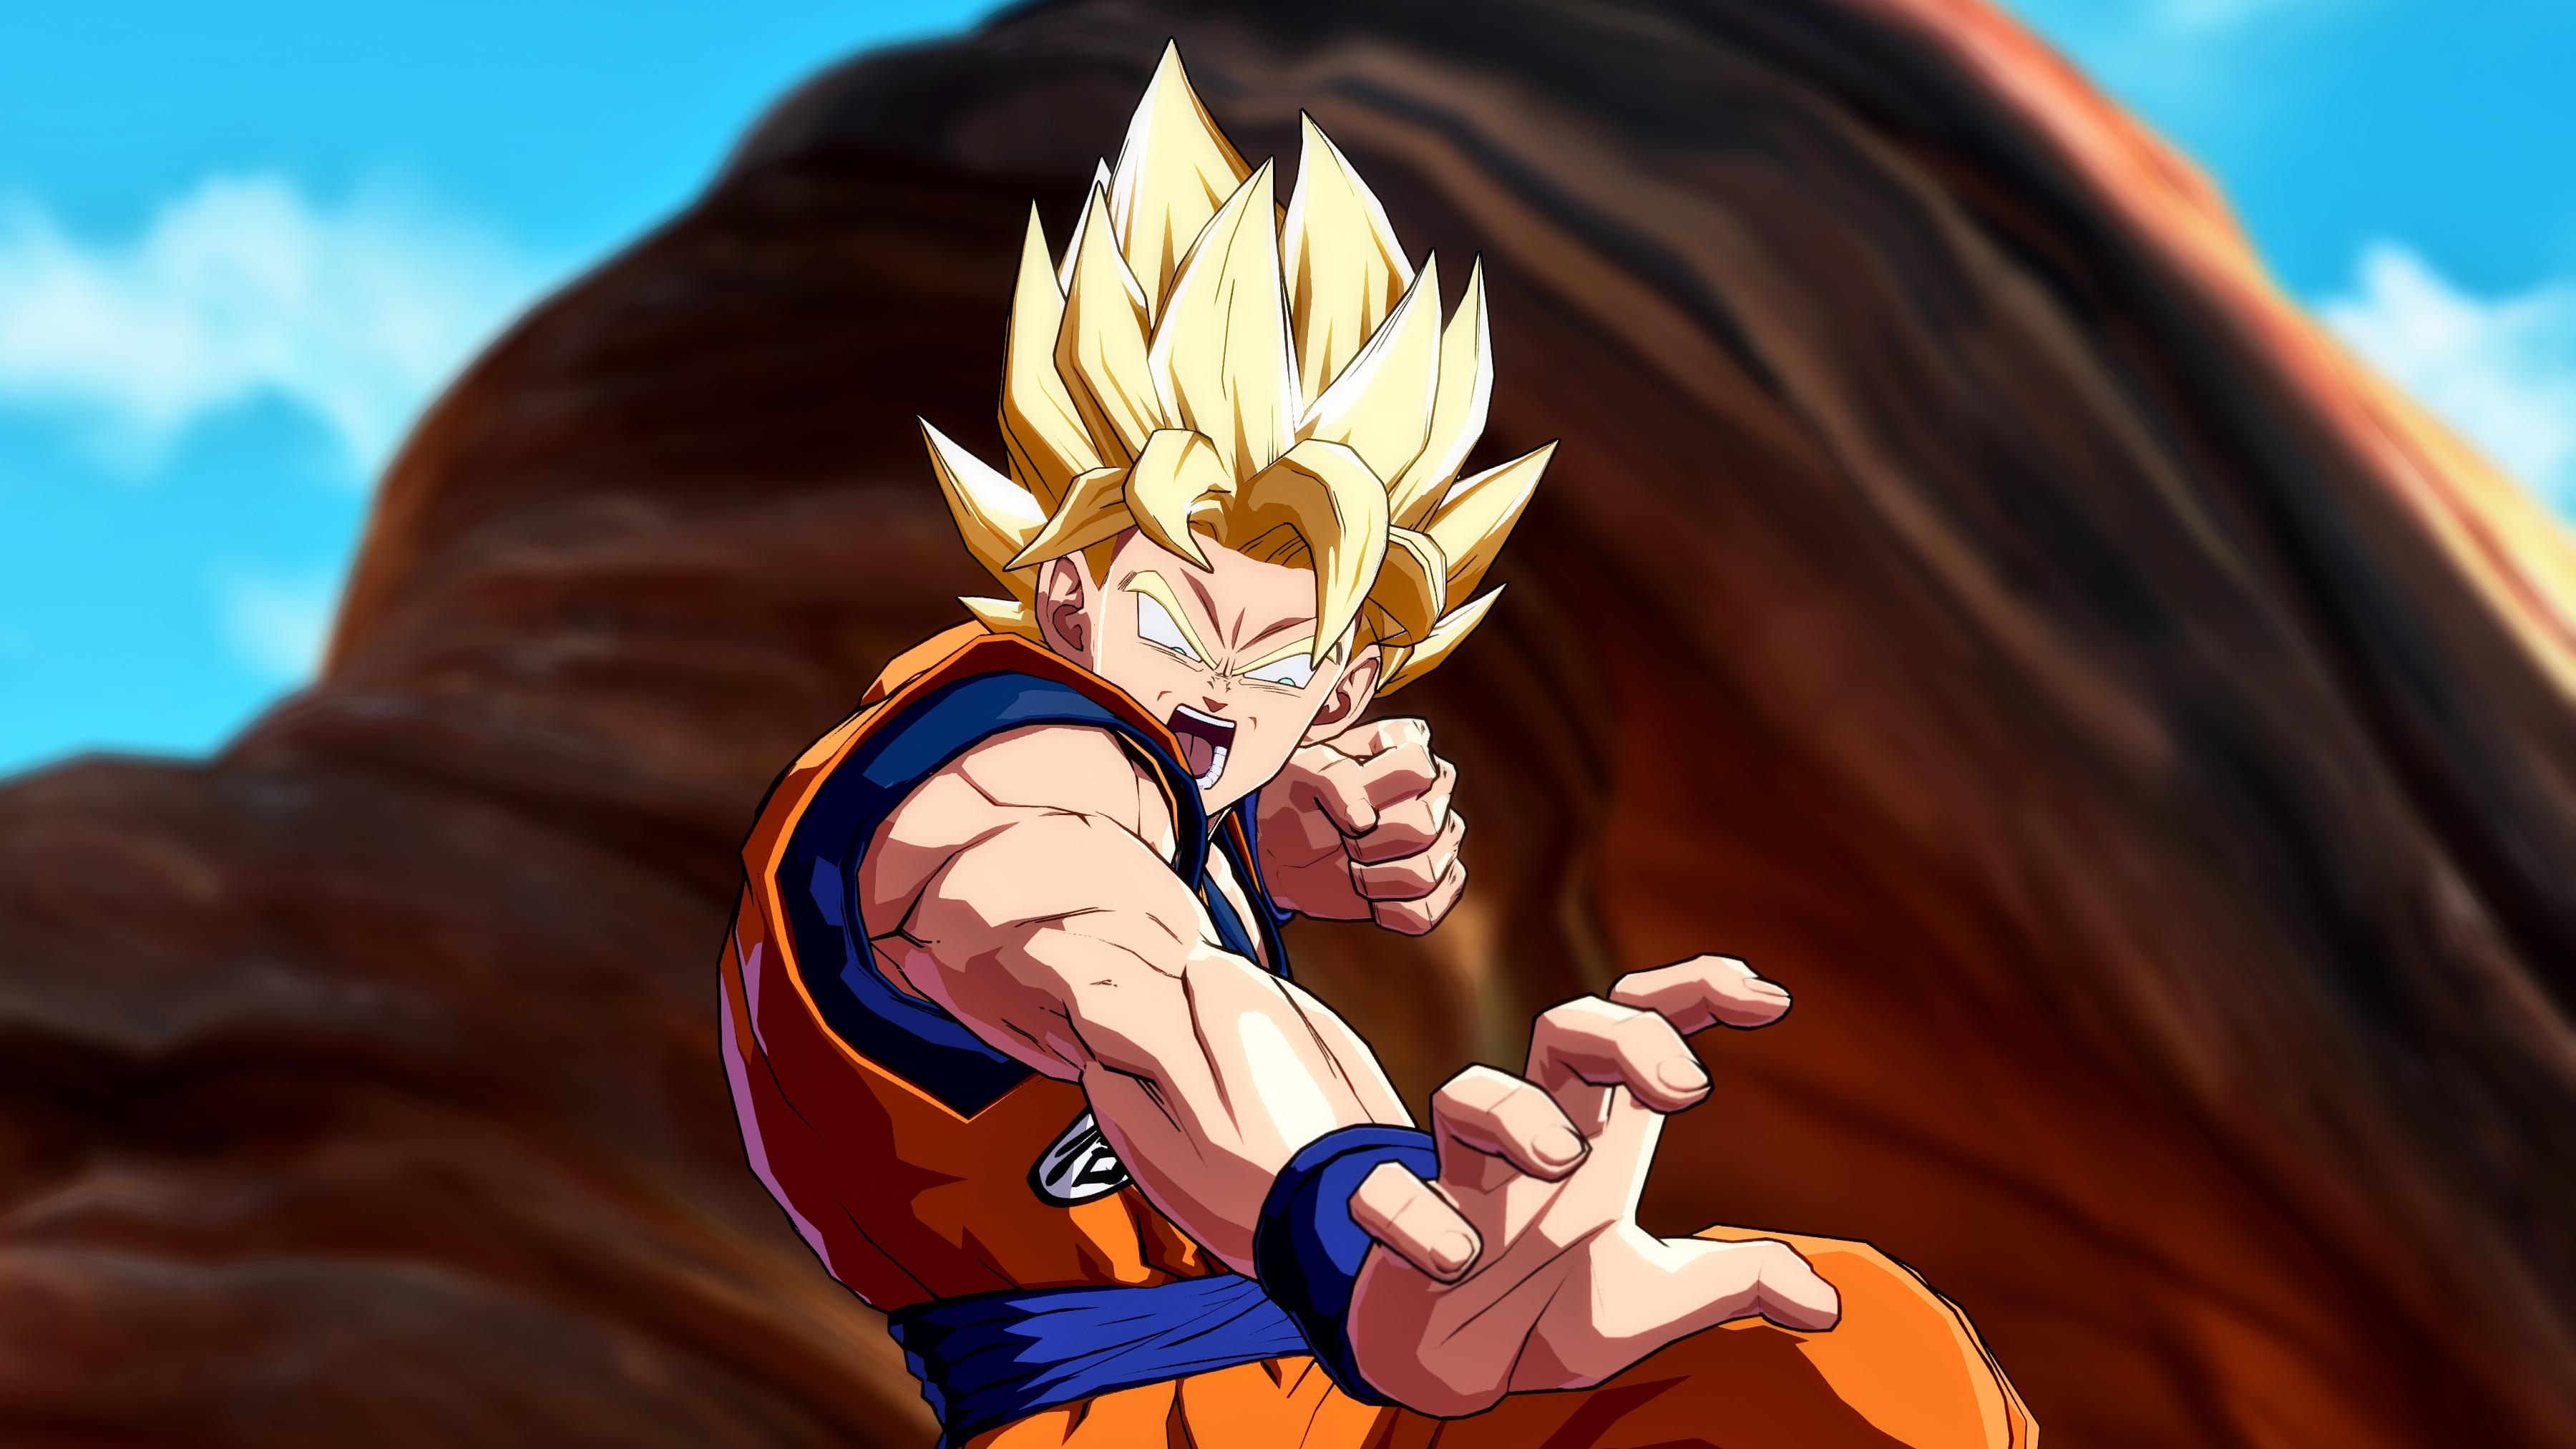 Saiyan Dragon Ball Fighterz, HD Games, 4k Wallpapers ...